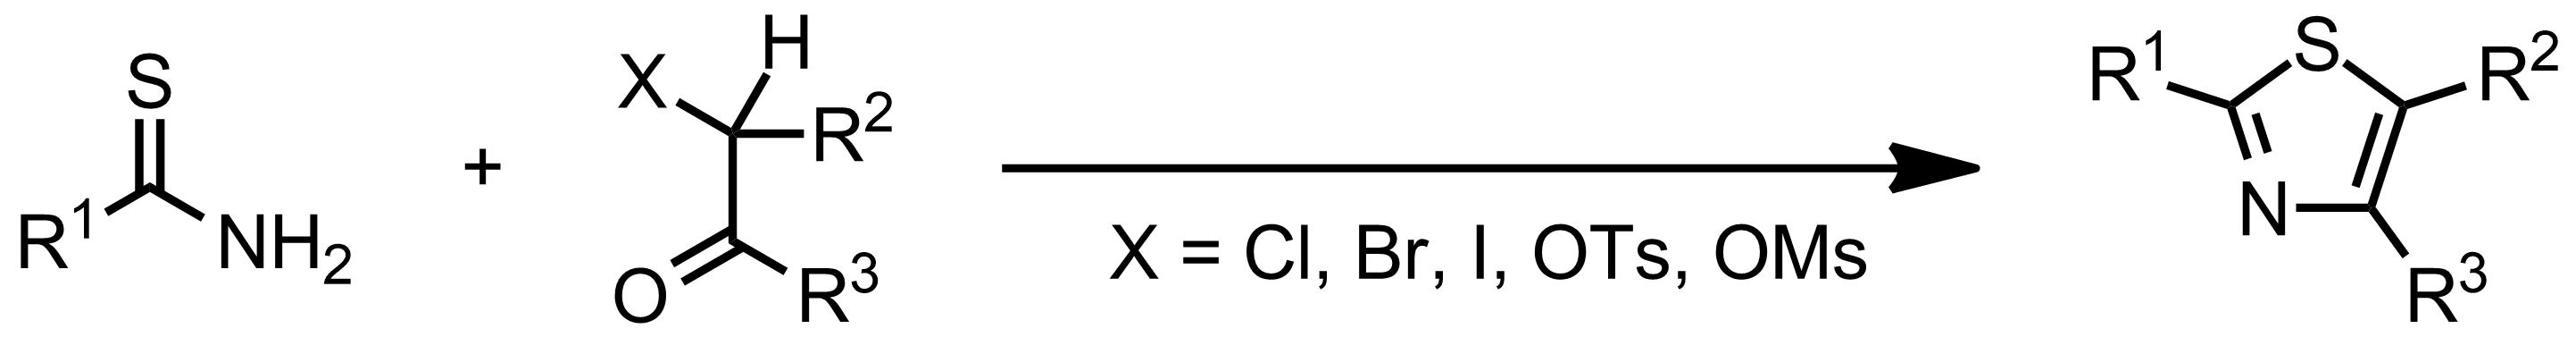 Schematic representation of the Hantzsch Thiazole Synthesis.